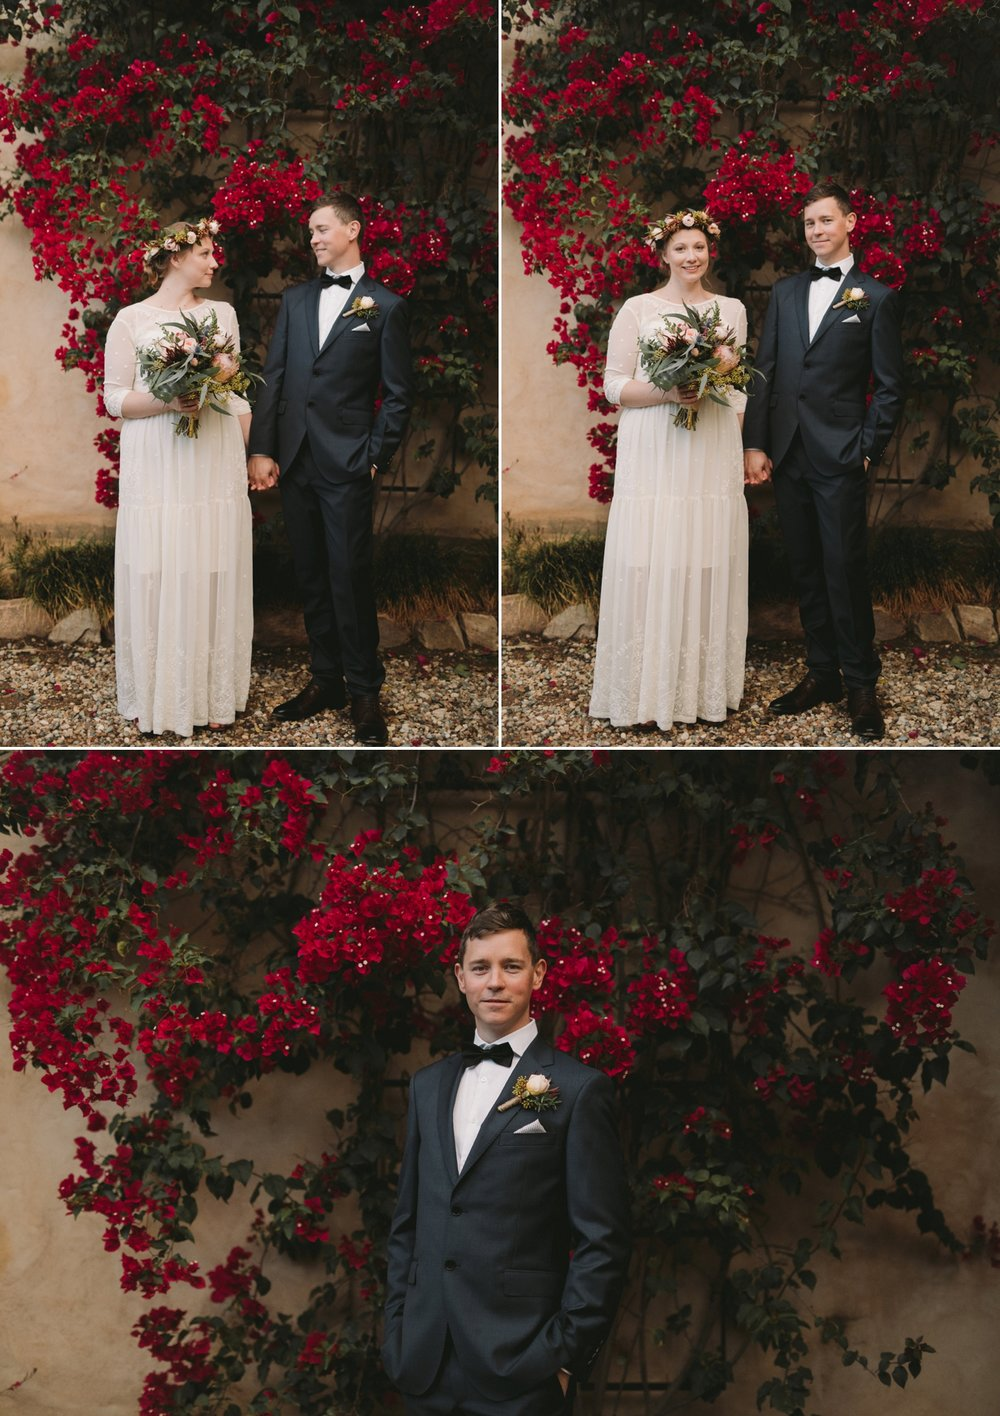 Jo & Aaron - Natural Wedding Photography in Adelaide - Beautiful, modern wedding photographer - Al Ru Farm Wedding Photography - Katherine Schultz_0036.jpg